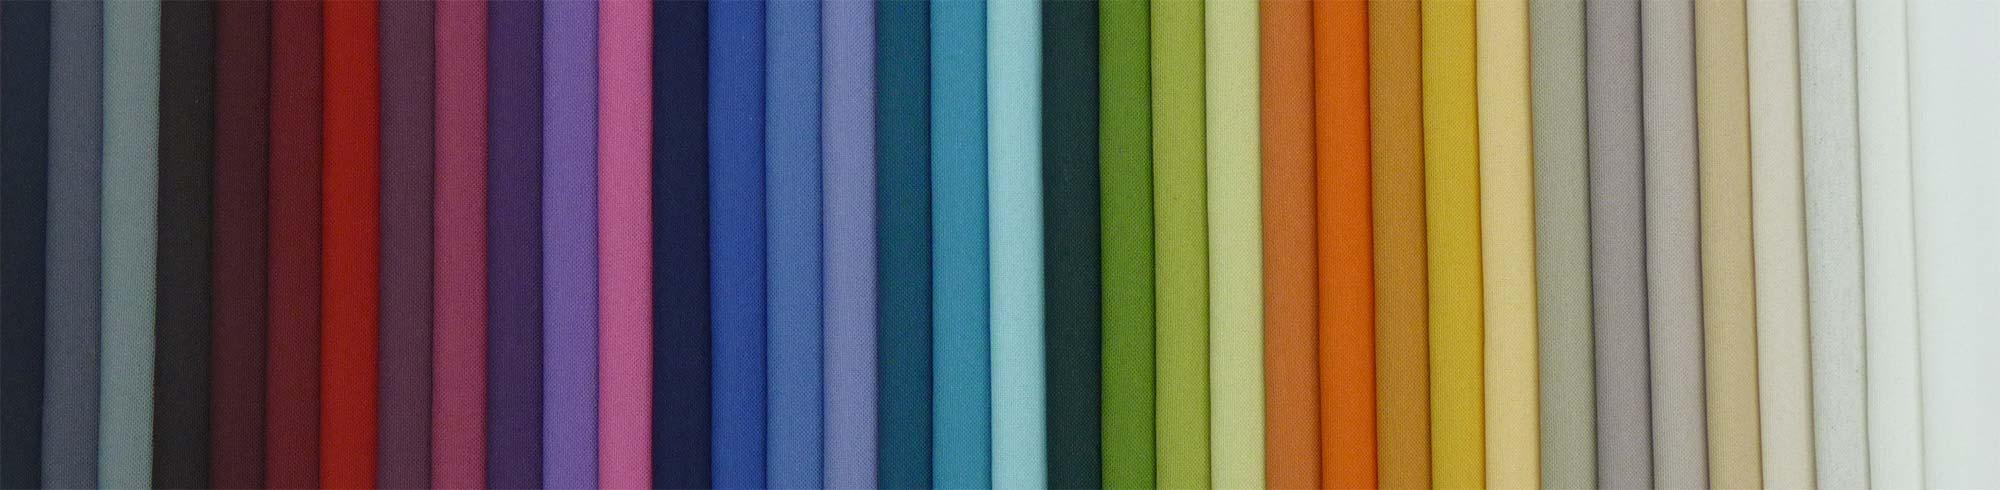 Cubre canap recto tela especial for Telas para visillos de salon